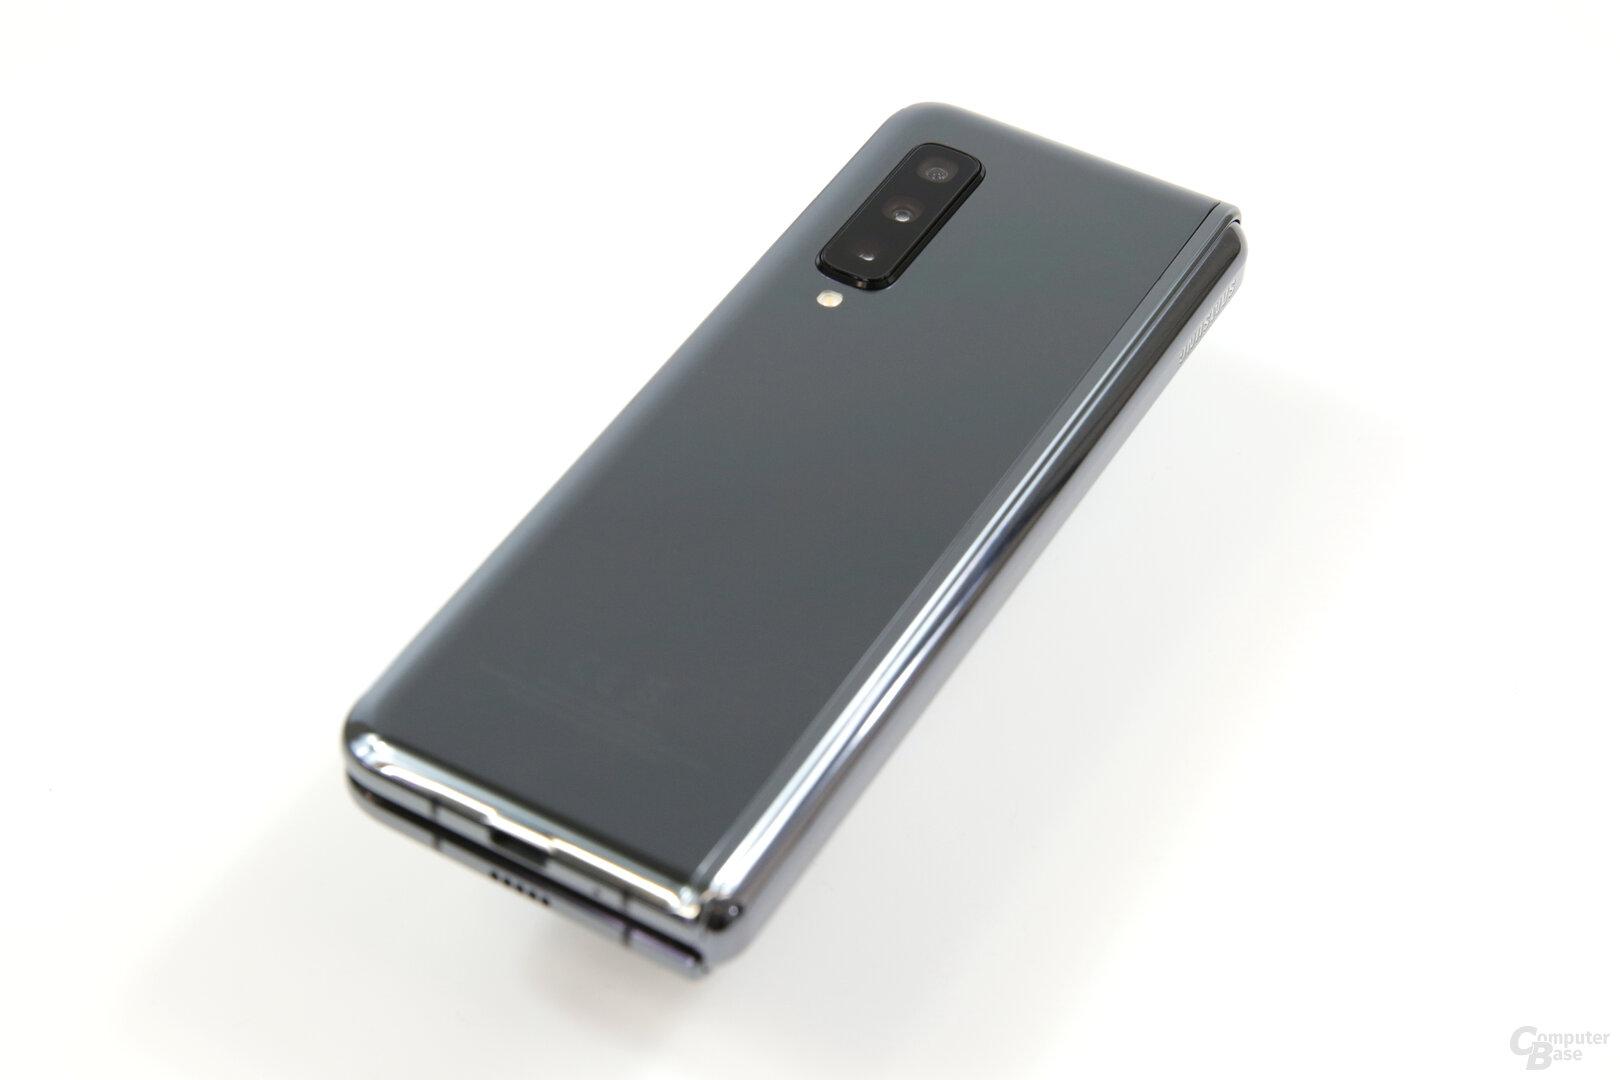 Triple-Kamera wie beim Galaxy S10